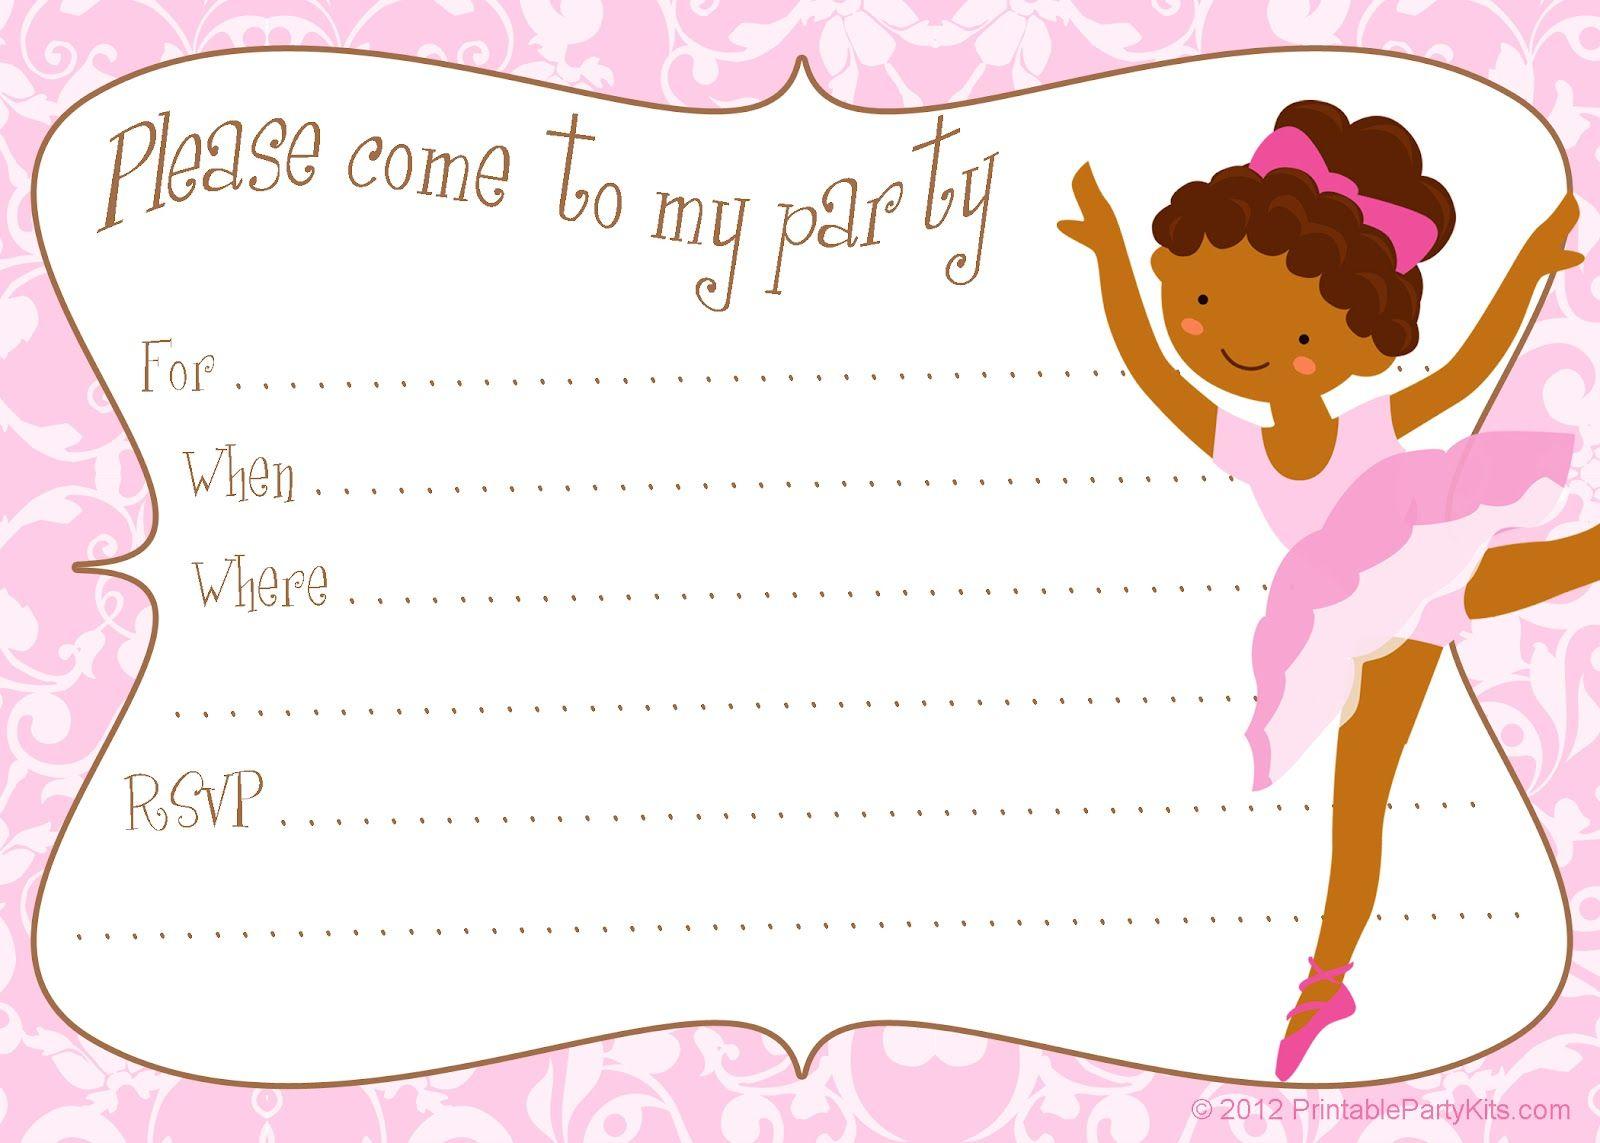 Free Printable Diy Ballerina Invitation Template | Party Printables - Free Printable Ballerina Birthday Invitations